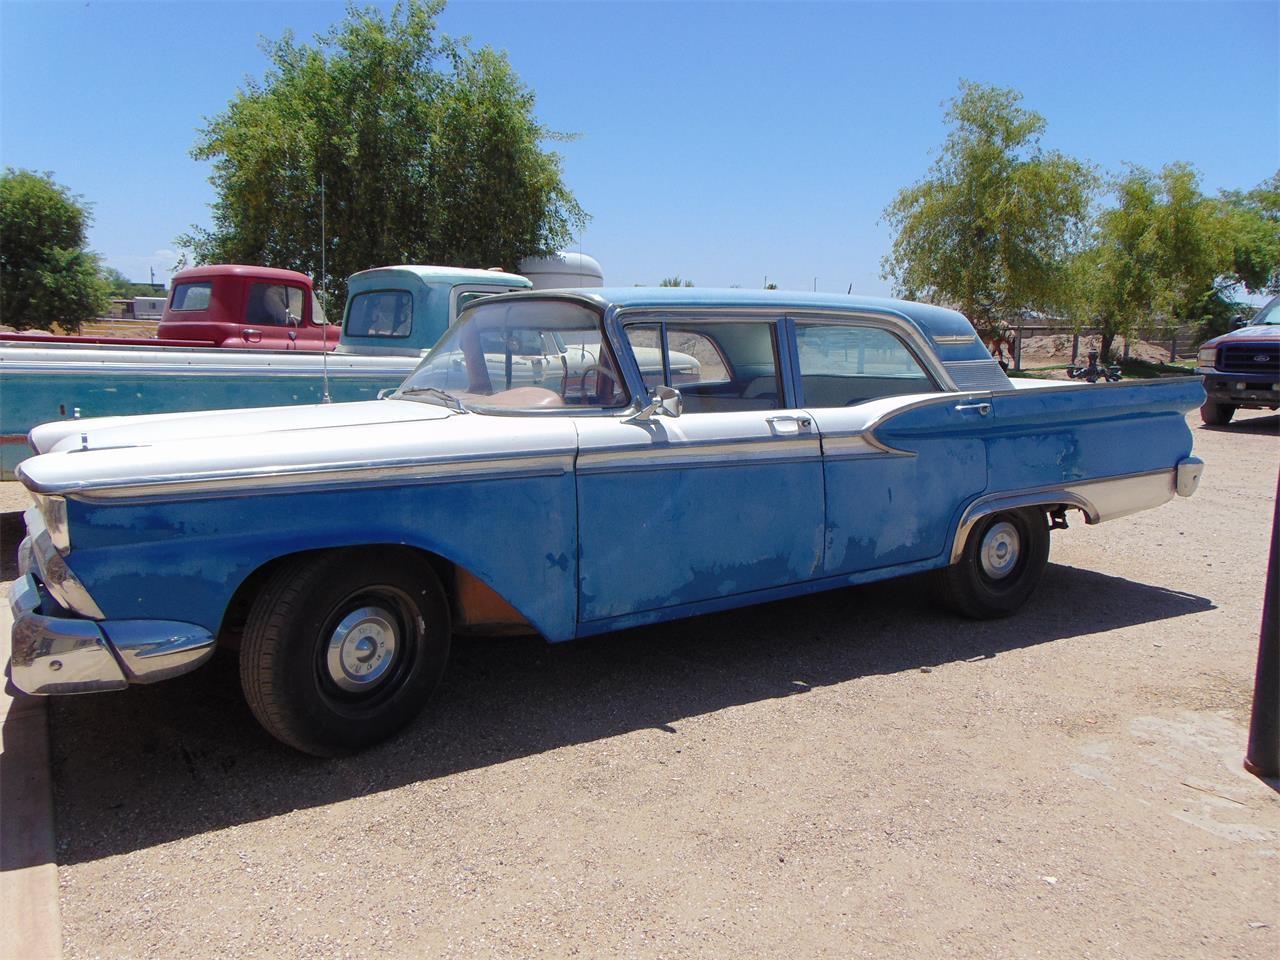 1959 Ford Galaxie 500 (CC-1362036) for sale in Phoenix, Arizona